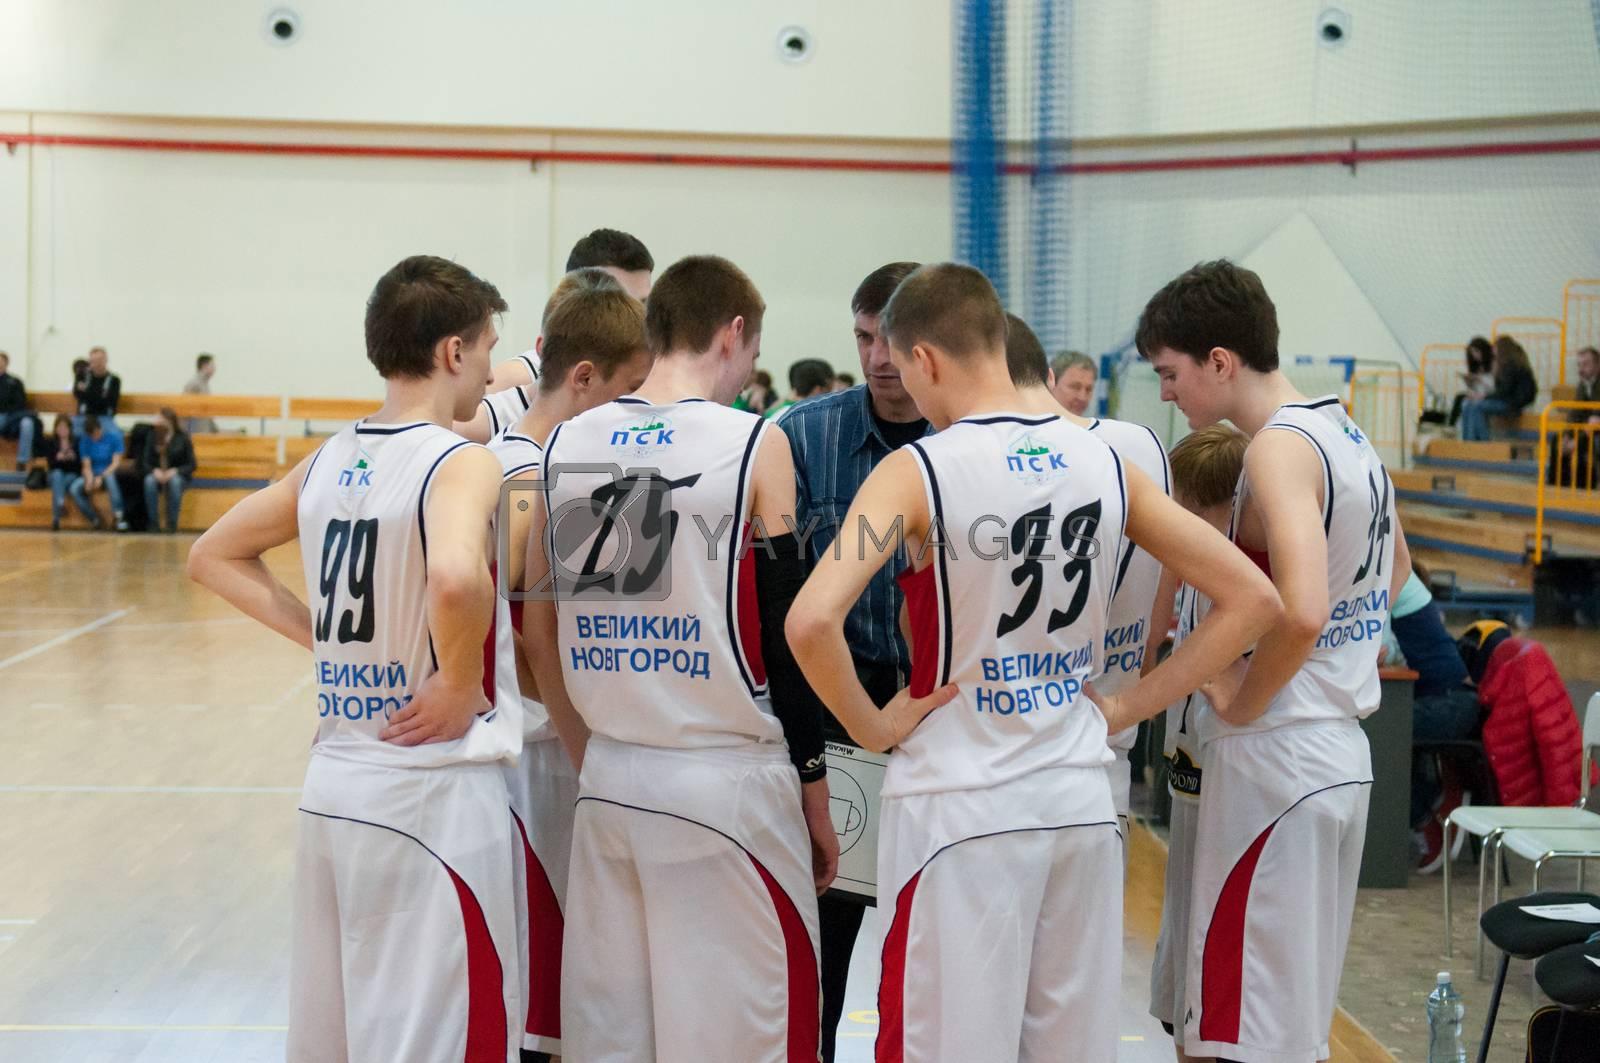 KALININGRAD - APRIL 4: Basketball competitions european youth basketball league (EYBL), 4 April, 2014 in Kaliningrad Russia.